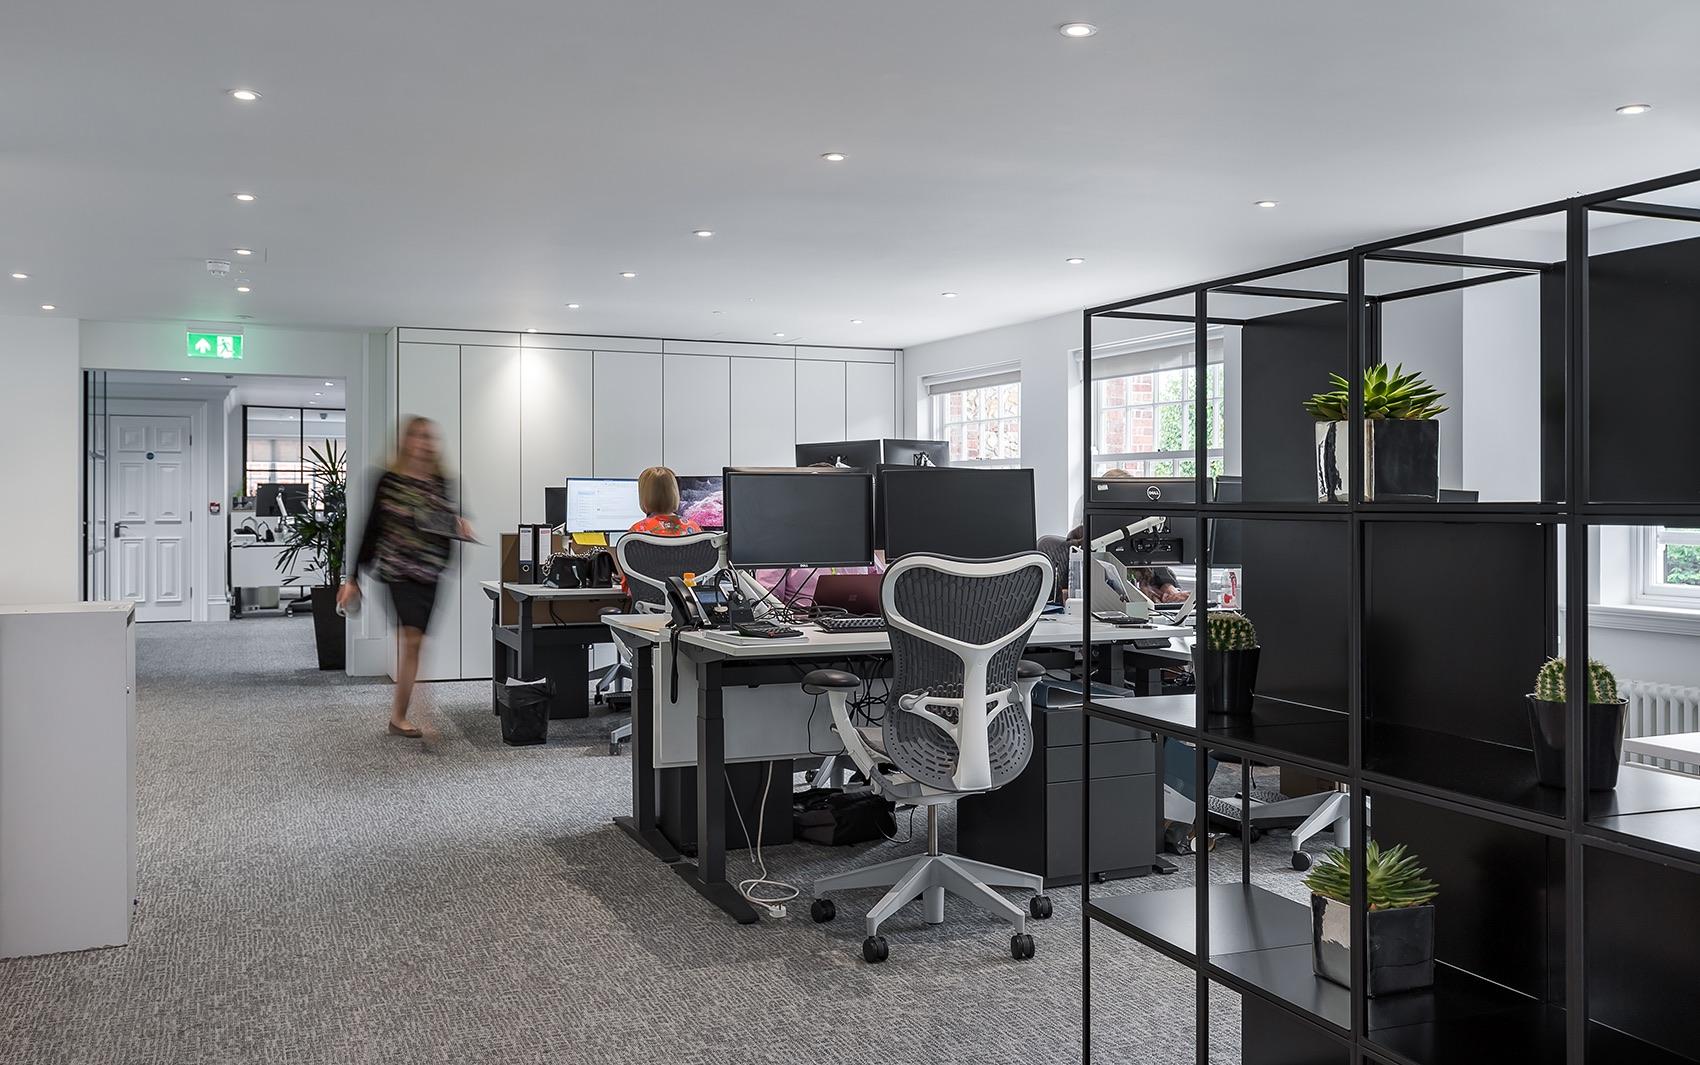 halma-amersham-office-26